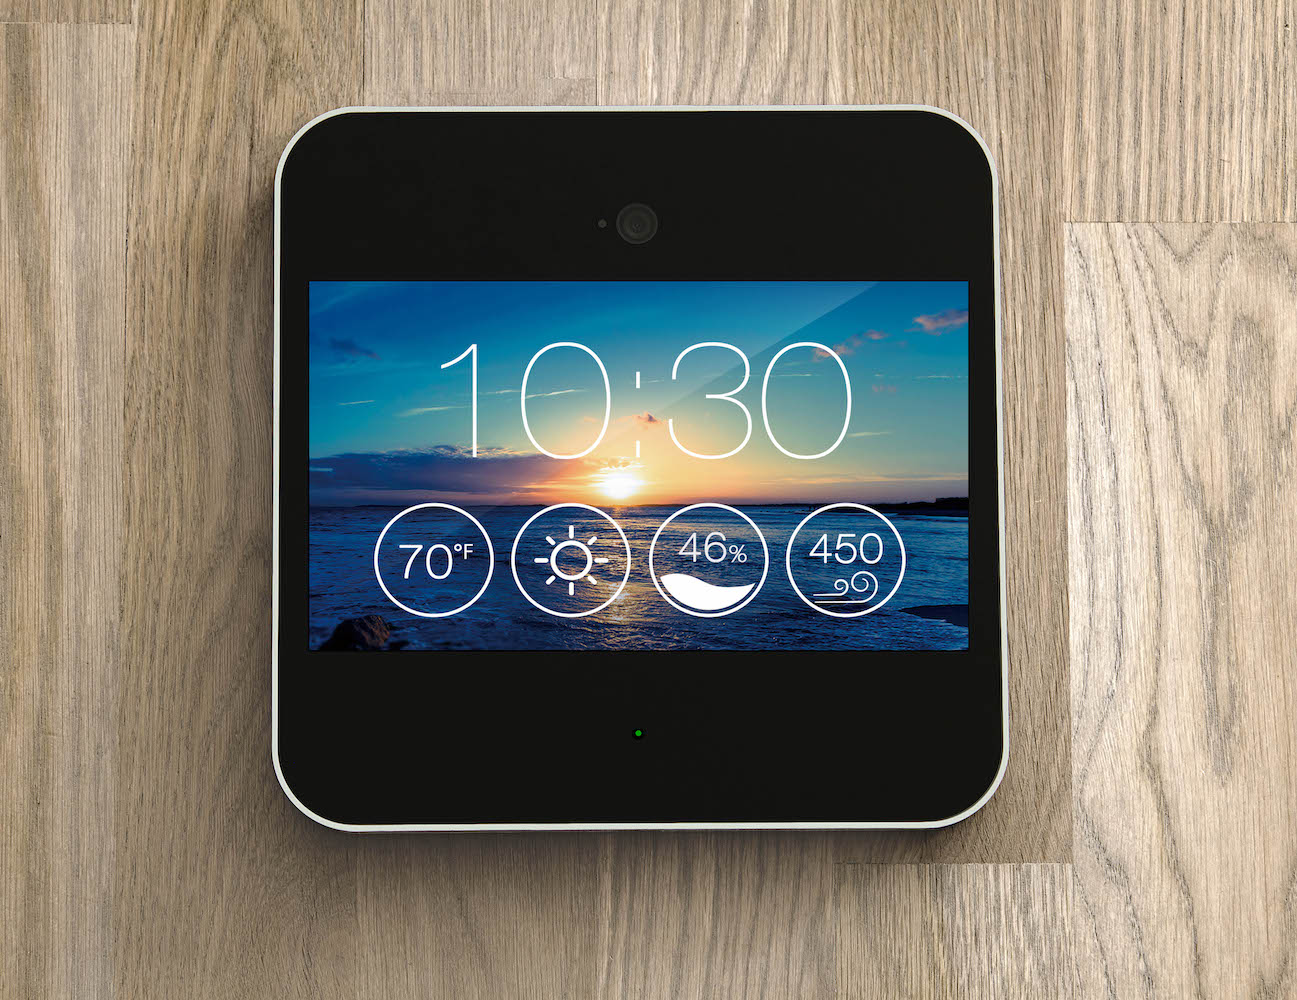 Sentri – Smart Home Monitoring Made Simple